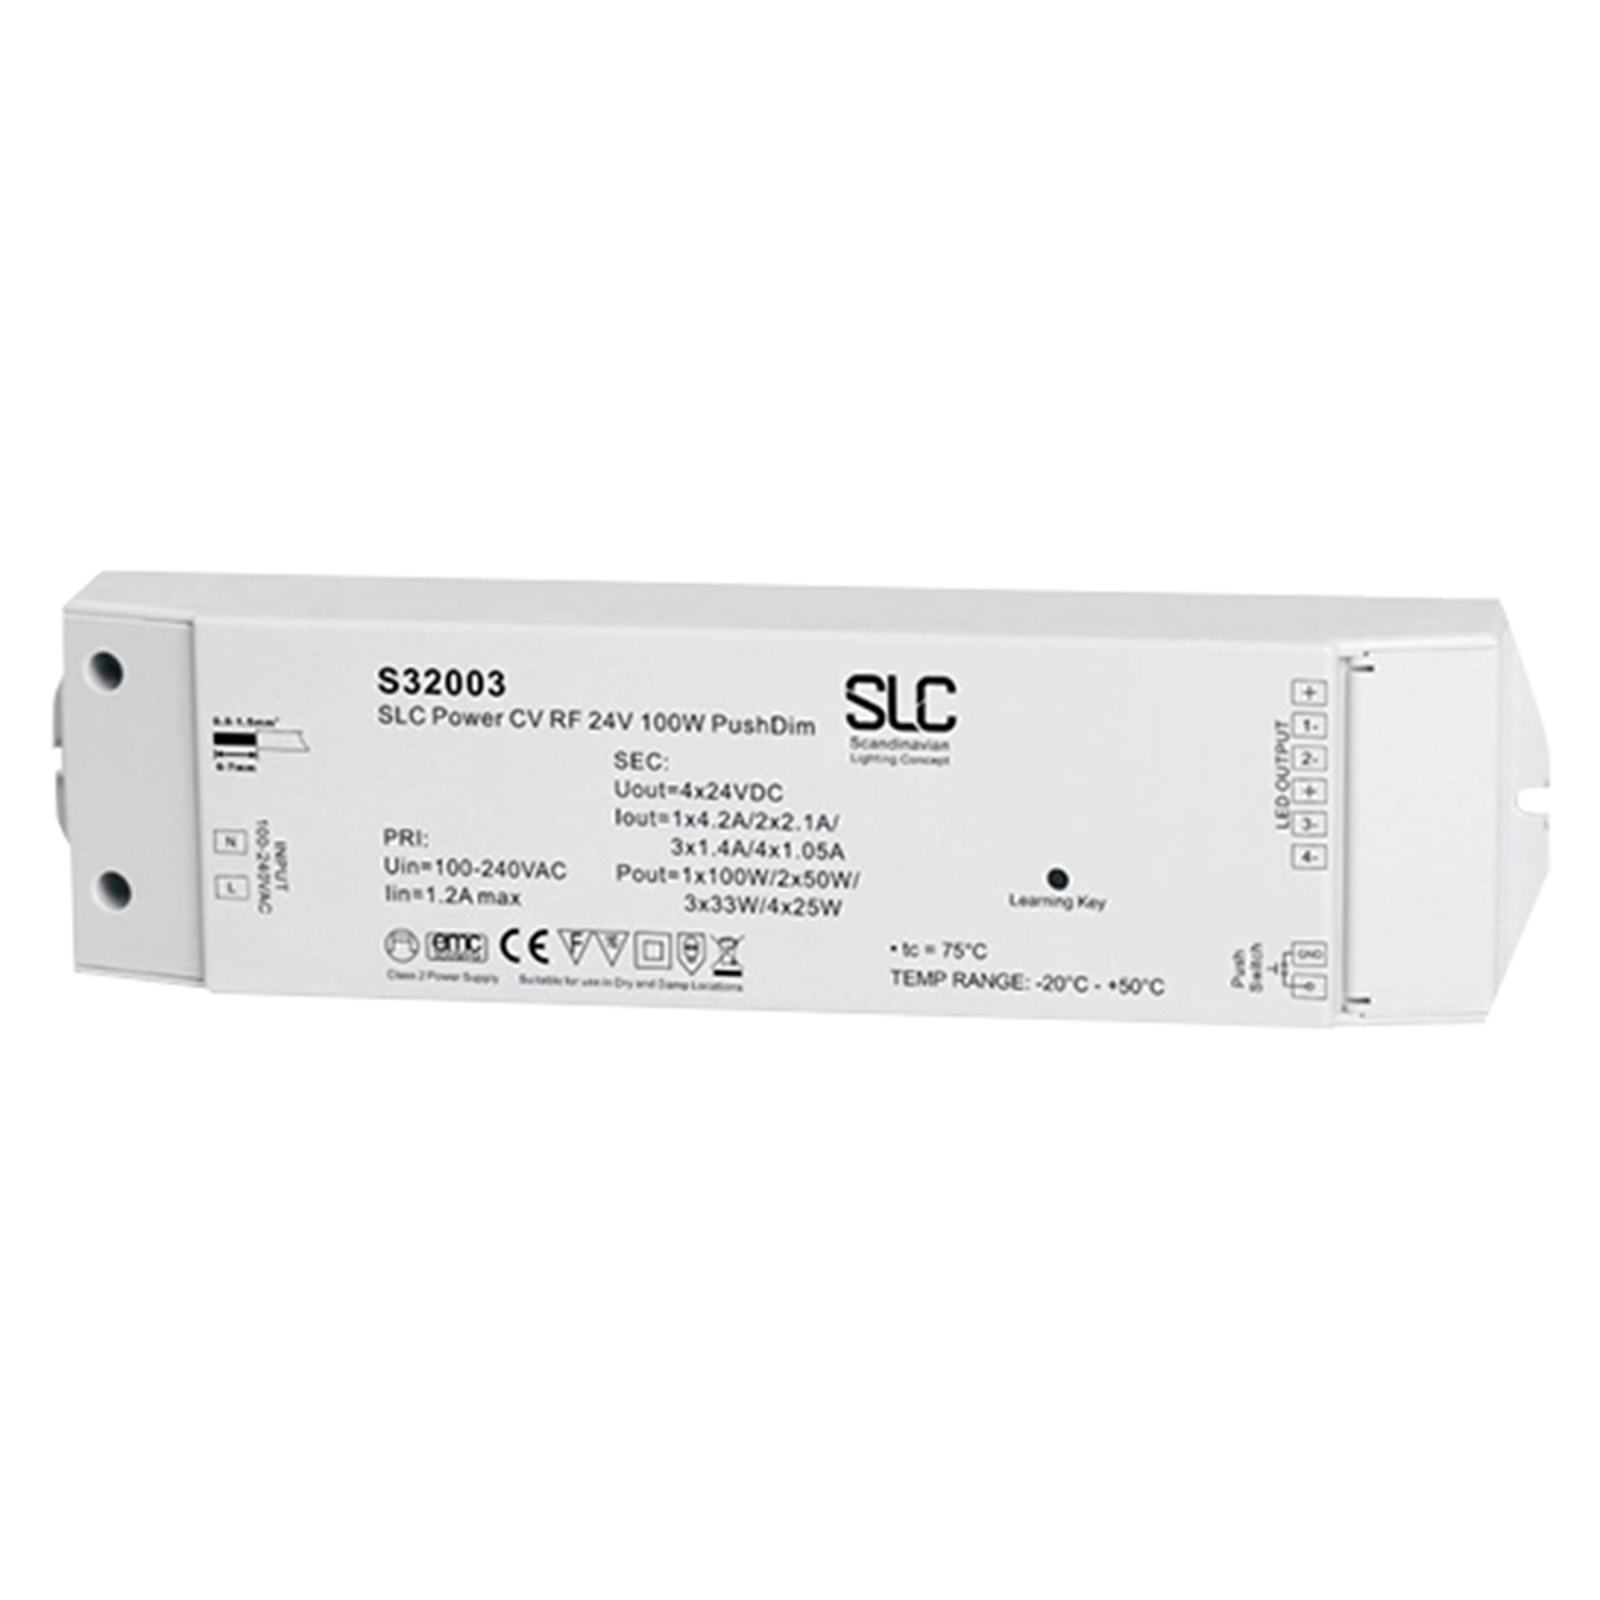 SLC Treiber PushDim/Funk, weiß und bunt, 24V, 100W